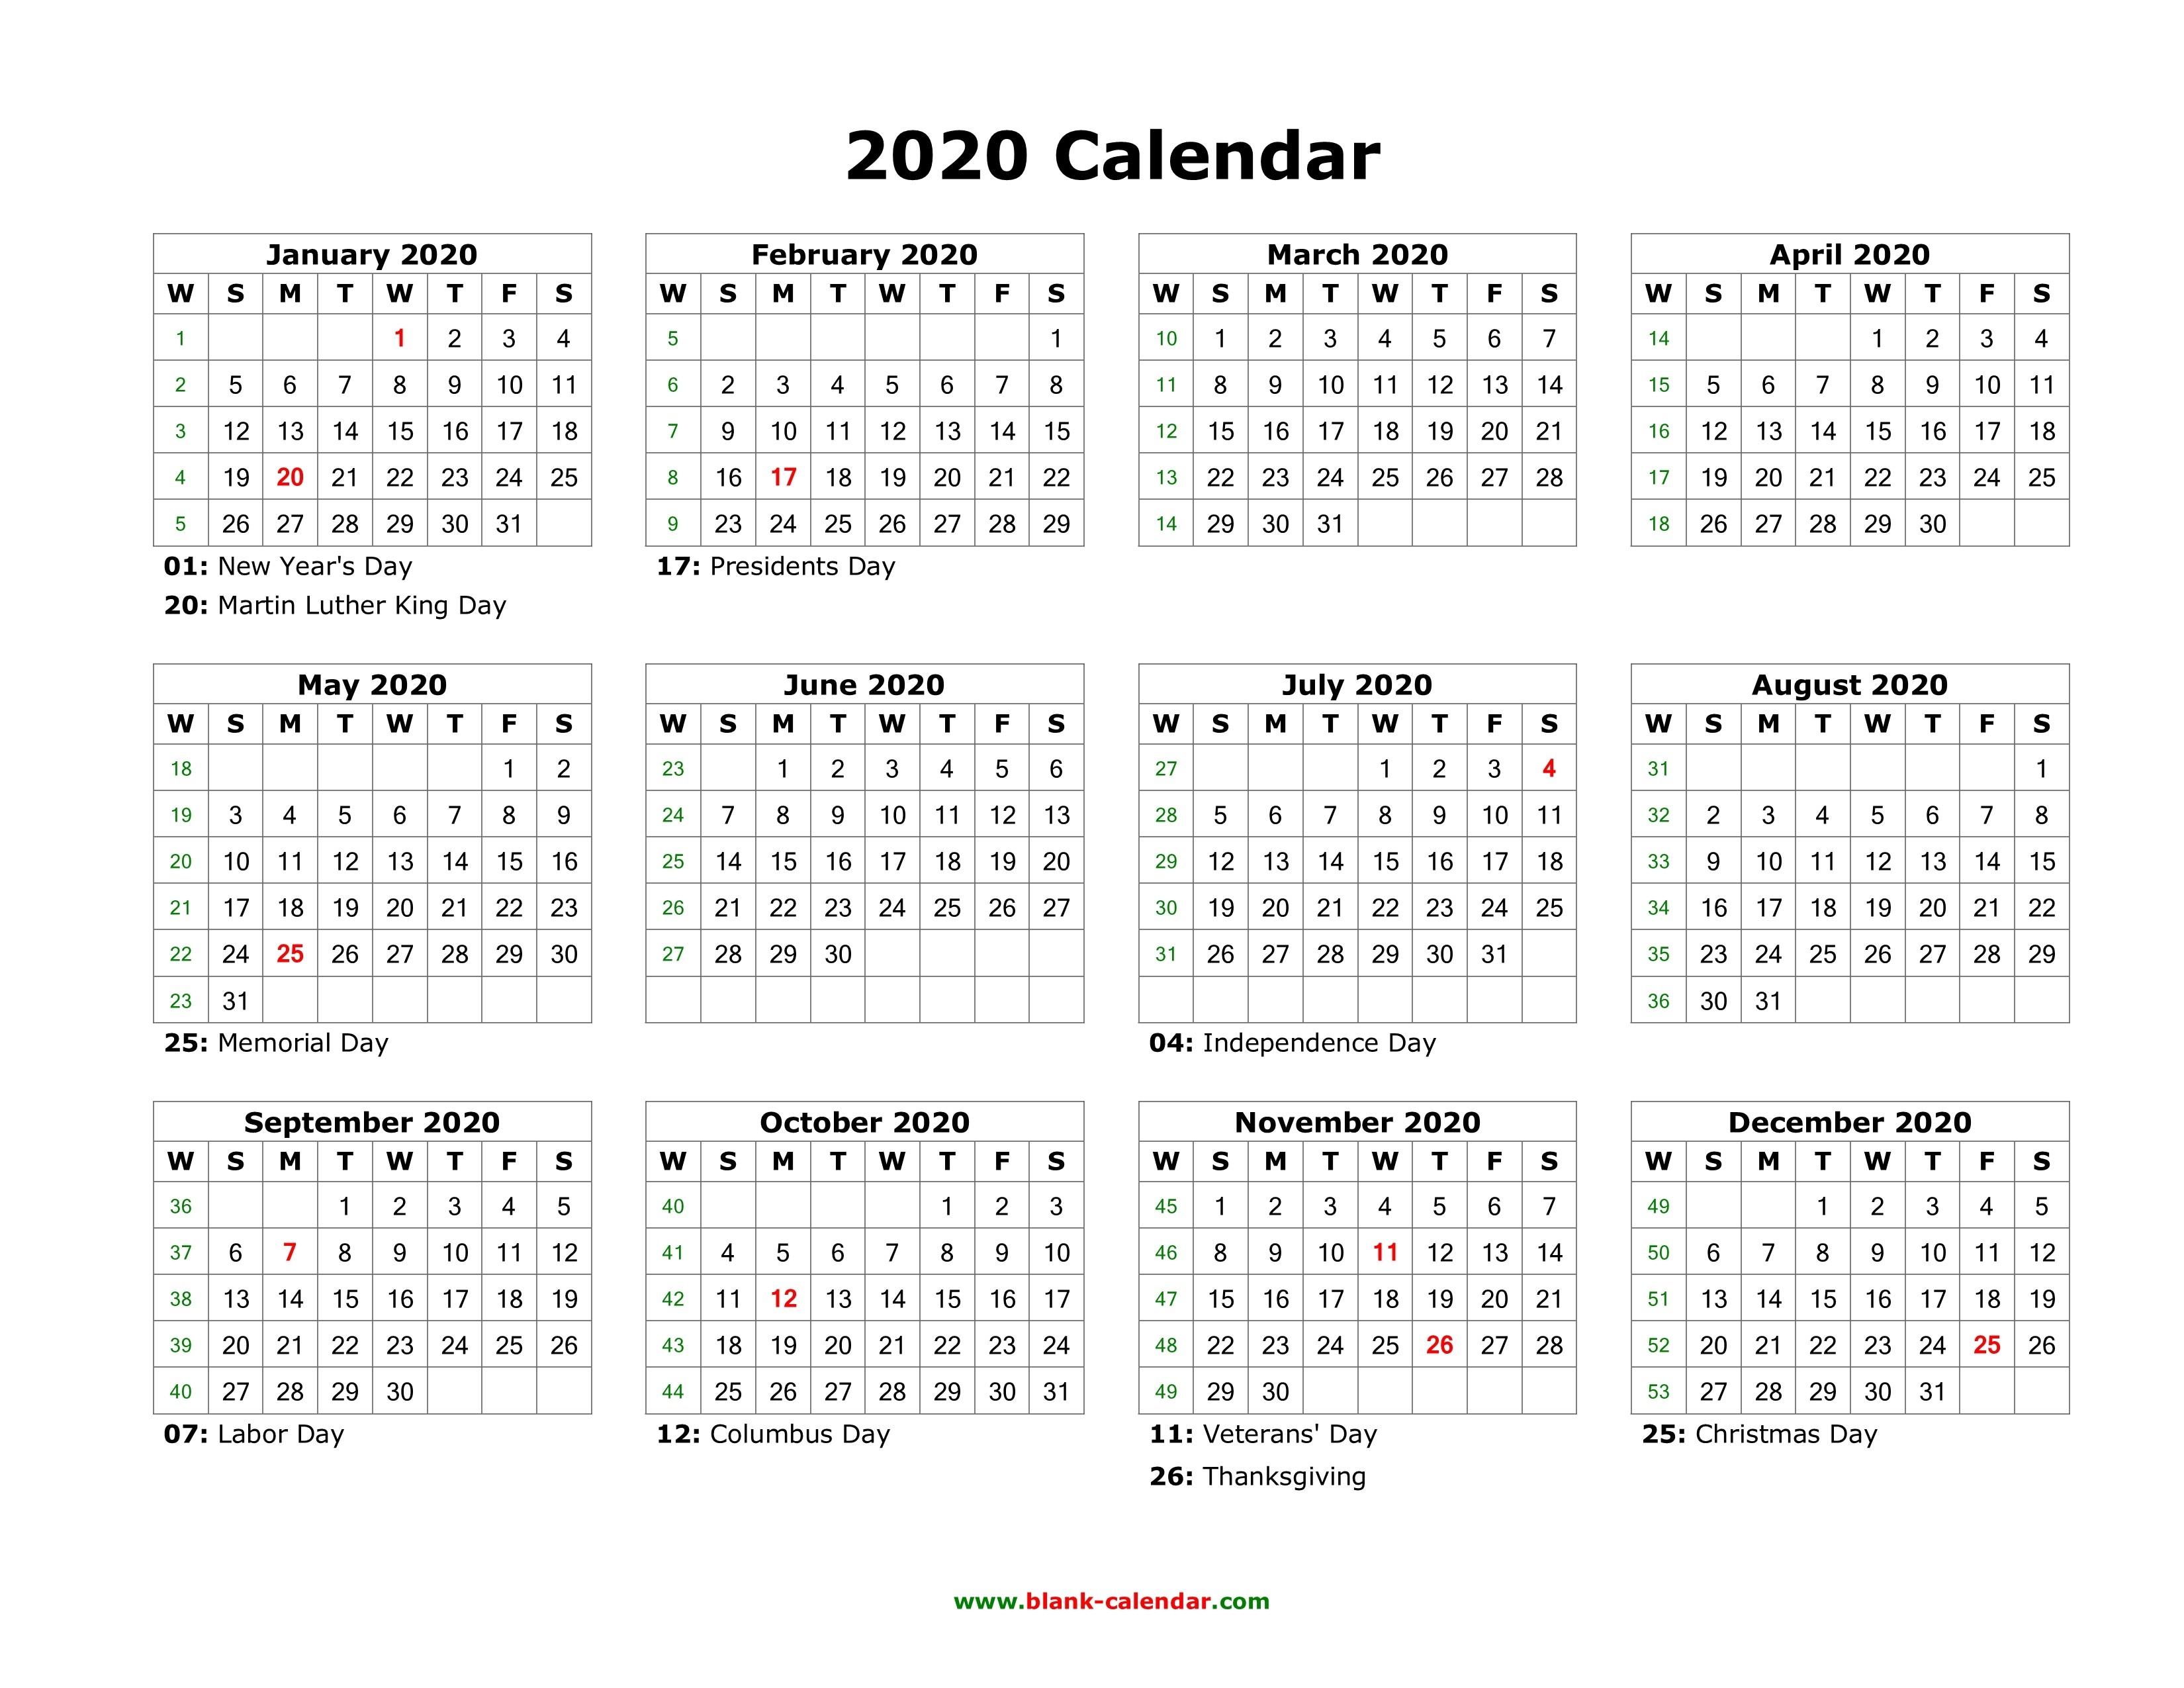 Blank Calendar 2020   Free Download Calendar Templates-Printable 2 Page Monthly Calendar 2020 Free